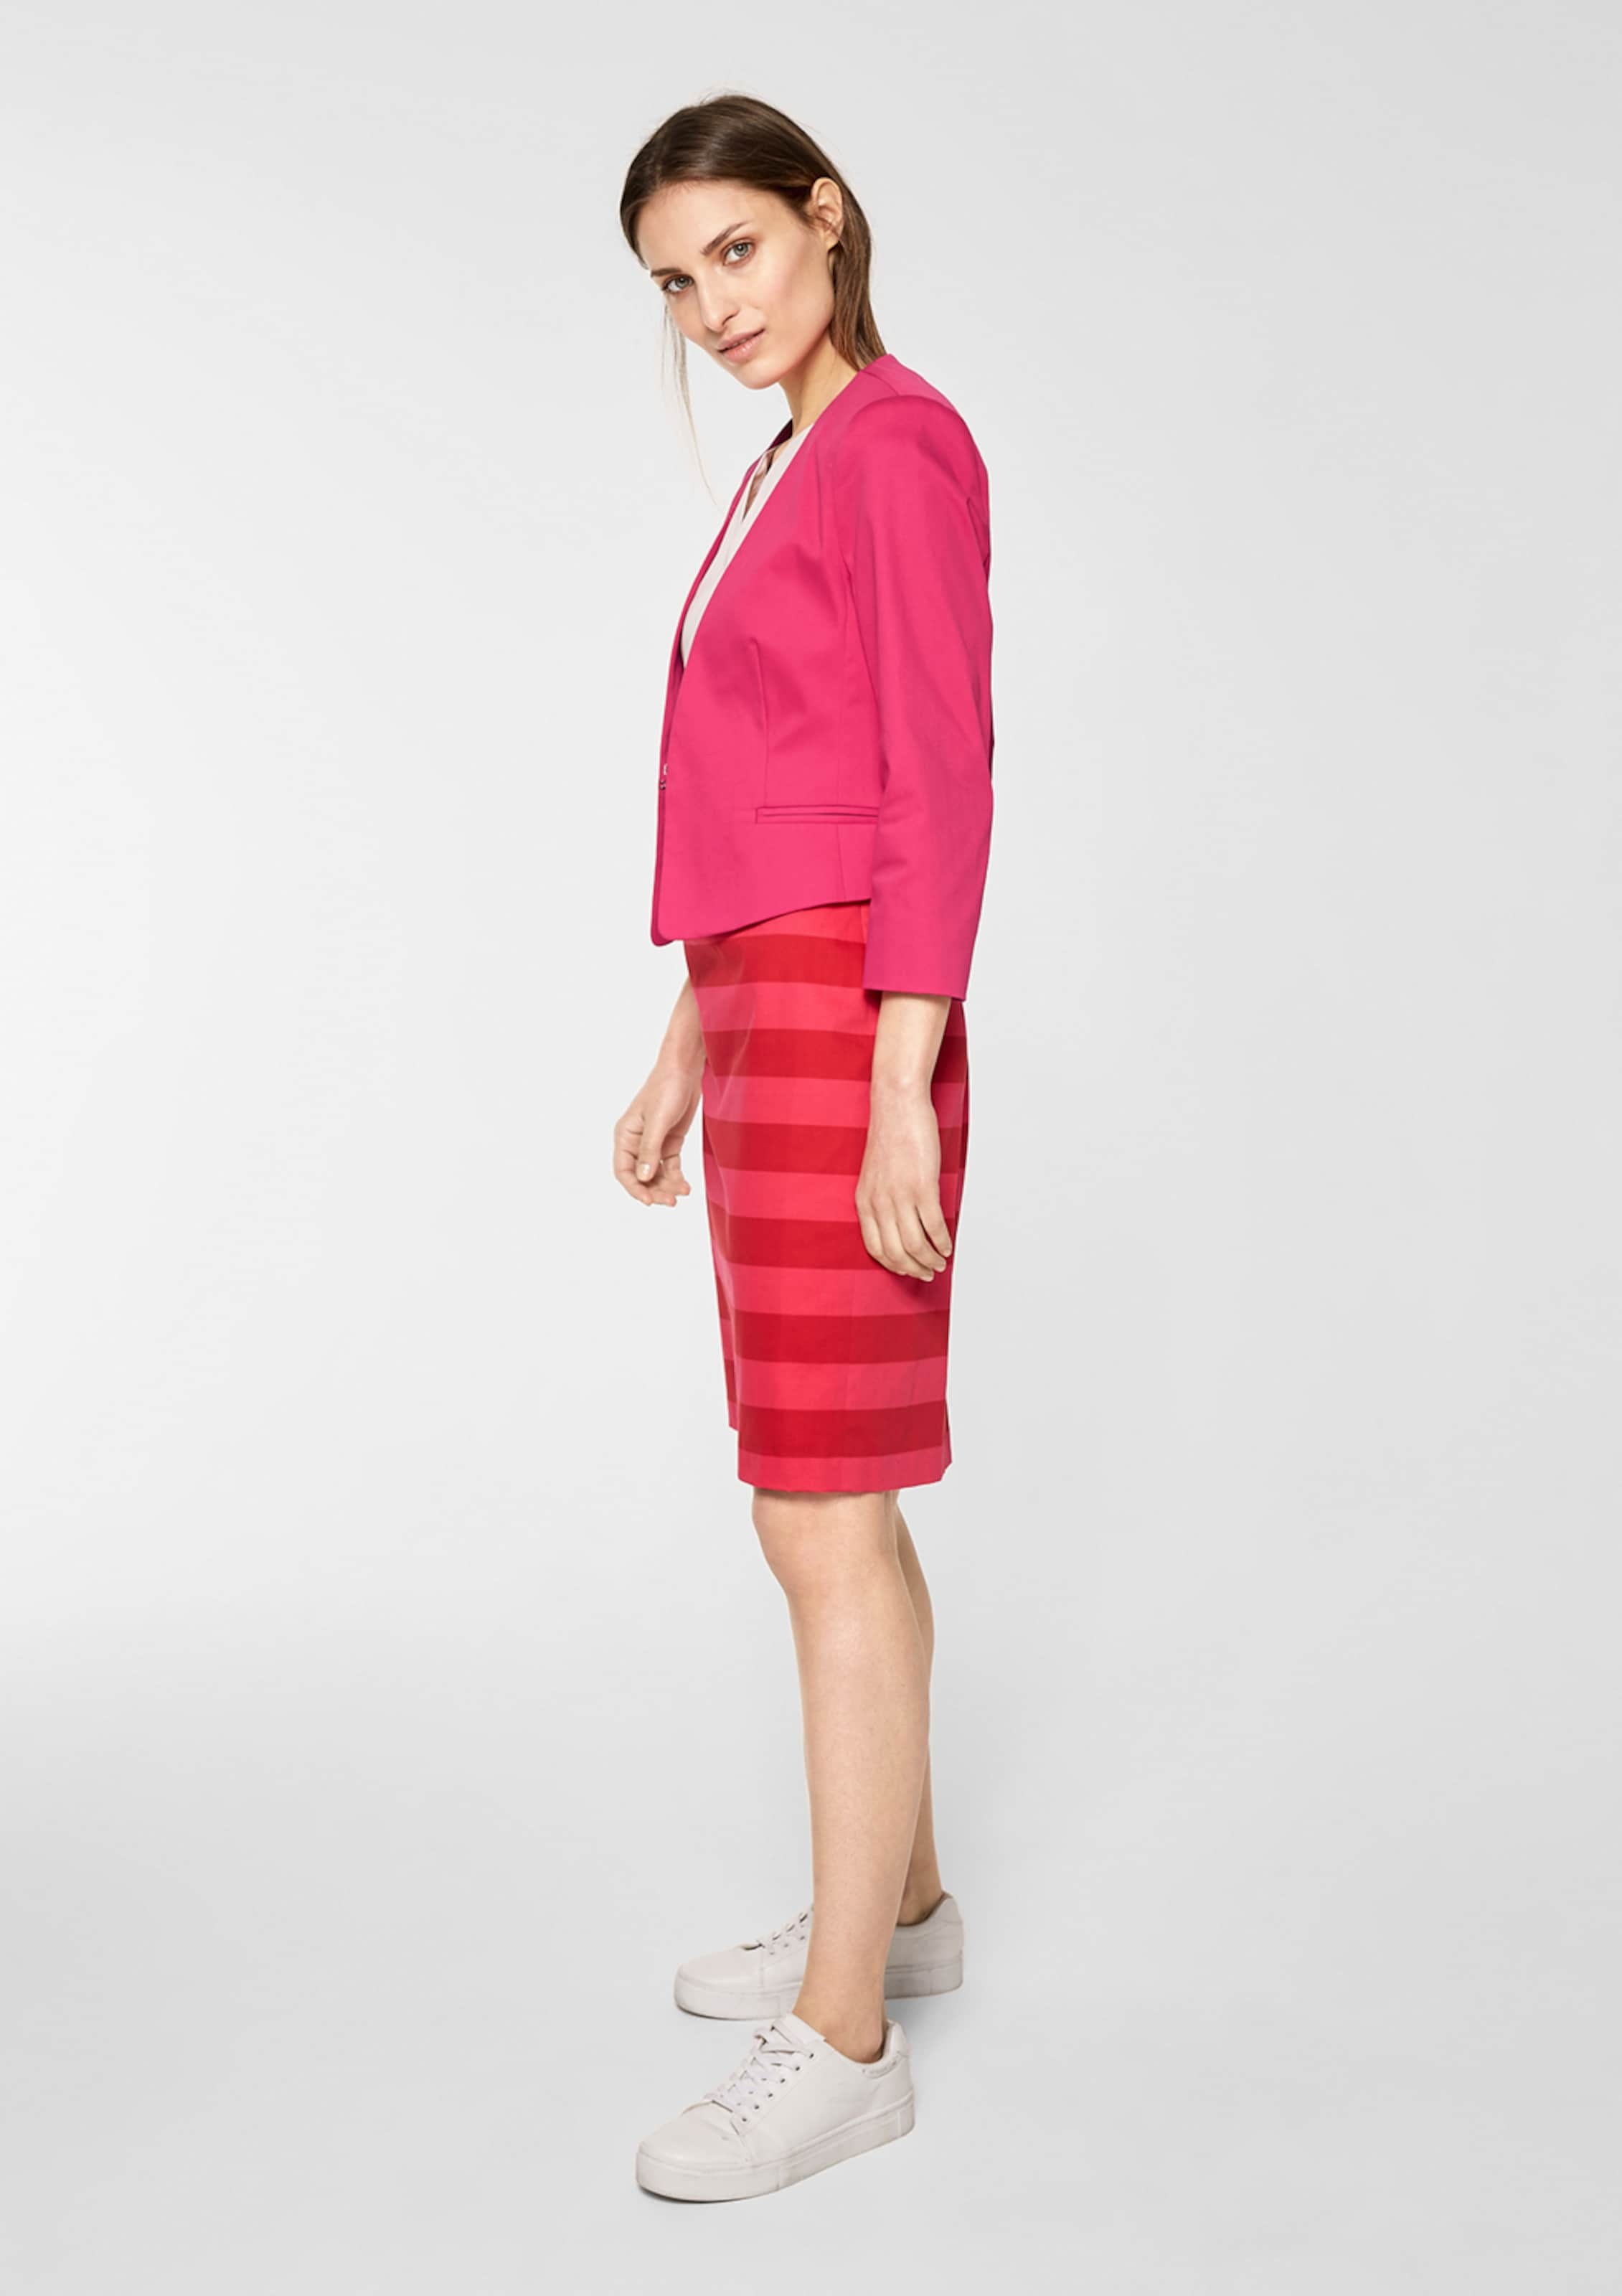 S optik Satin Kurzer Black Blazer Label In Pink oliver qUMzVpS